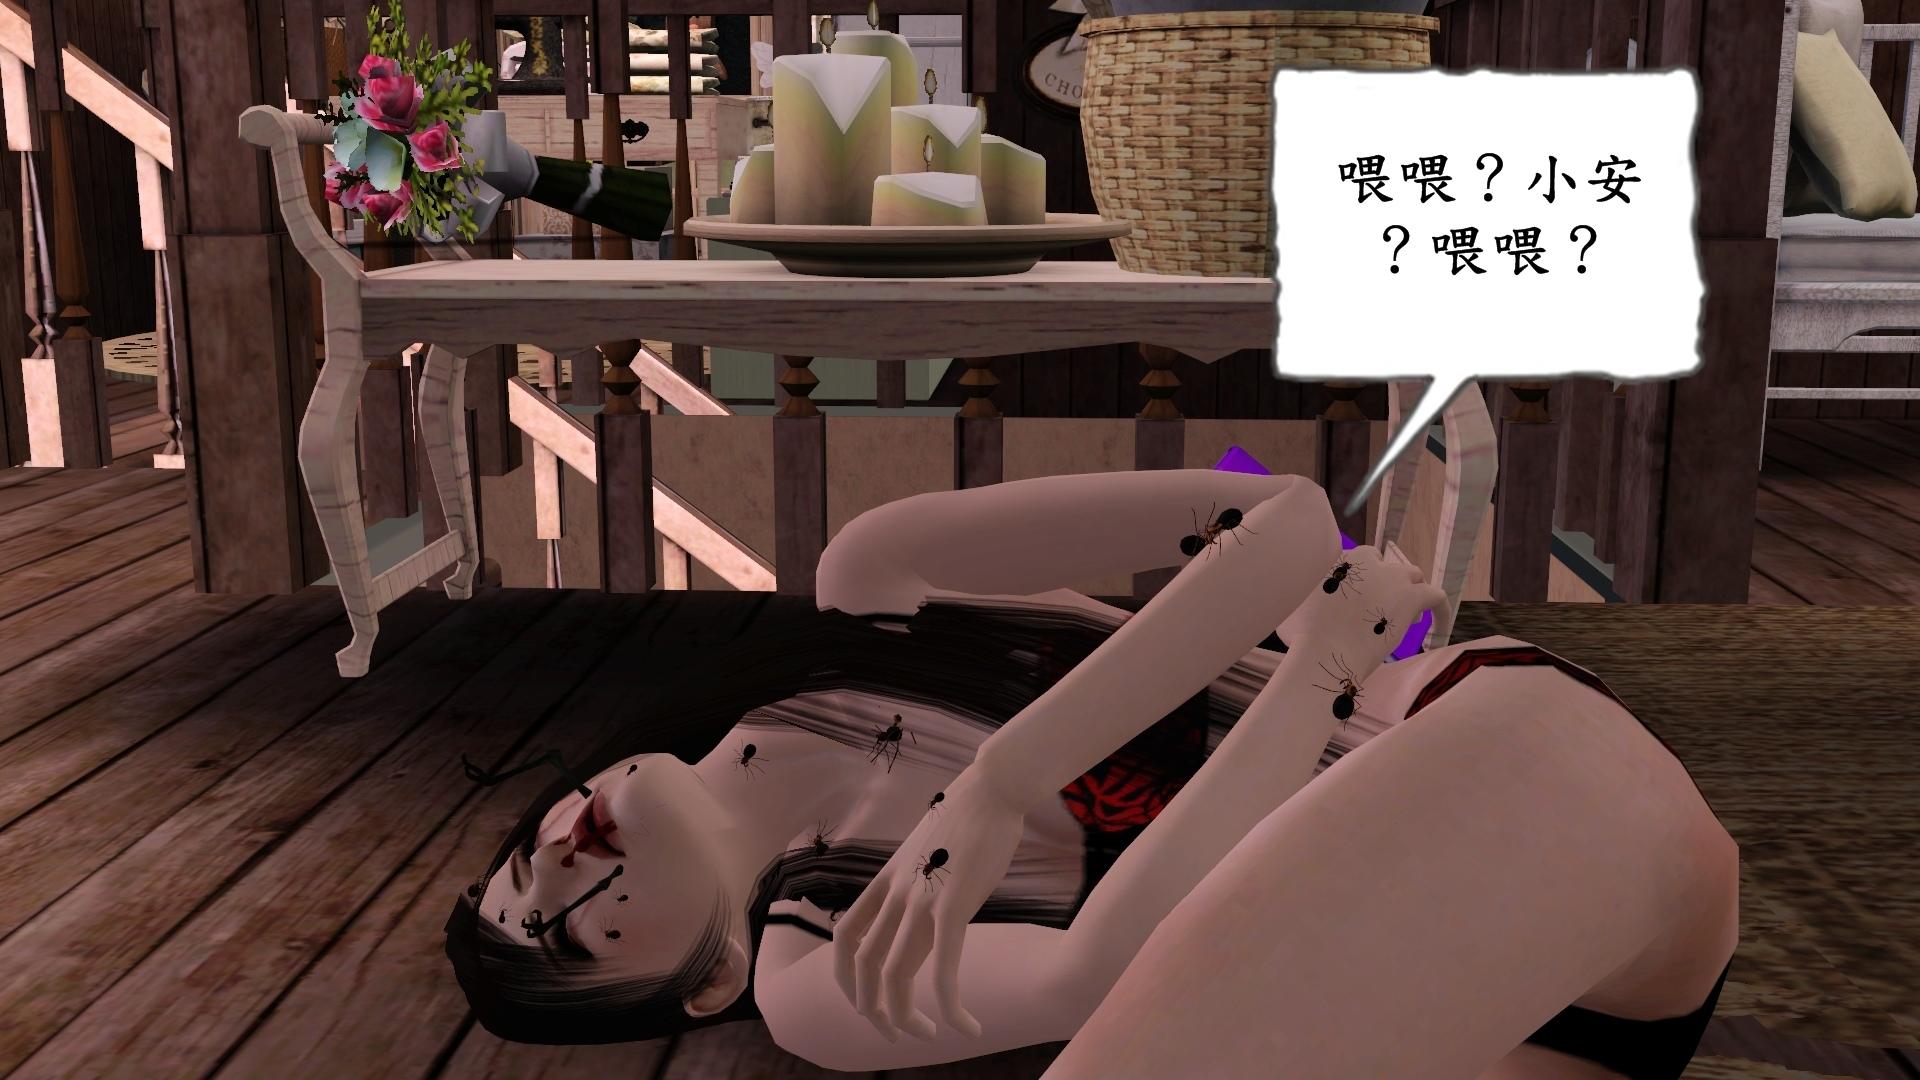 A34喂喂?小安?.jpg